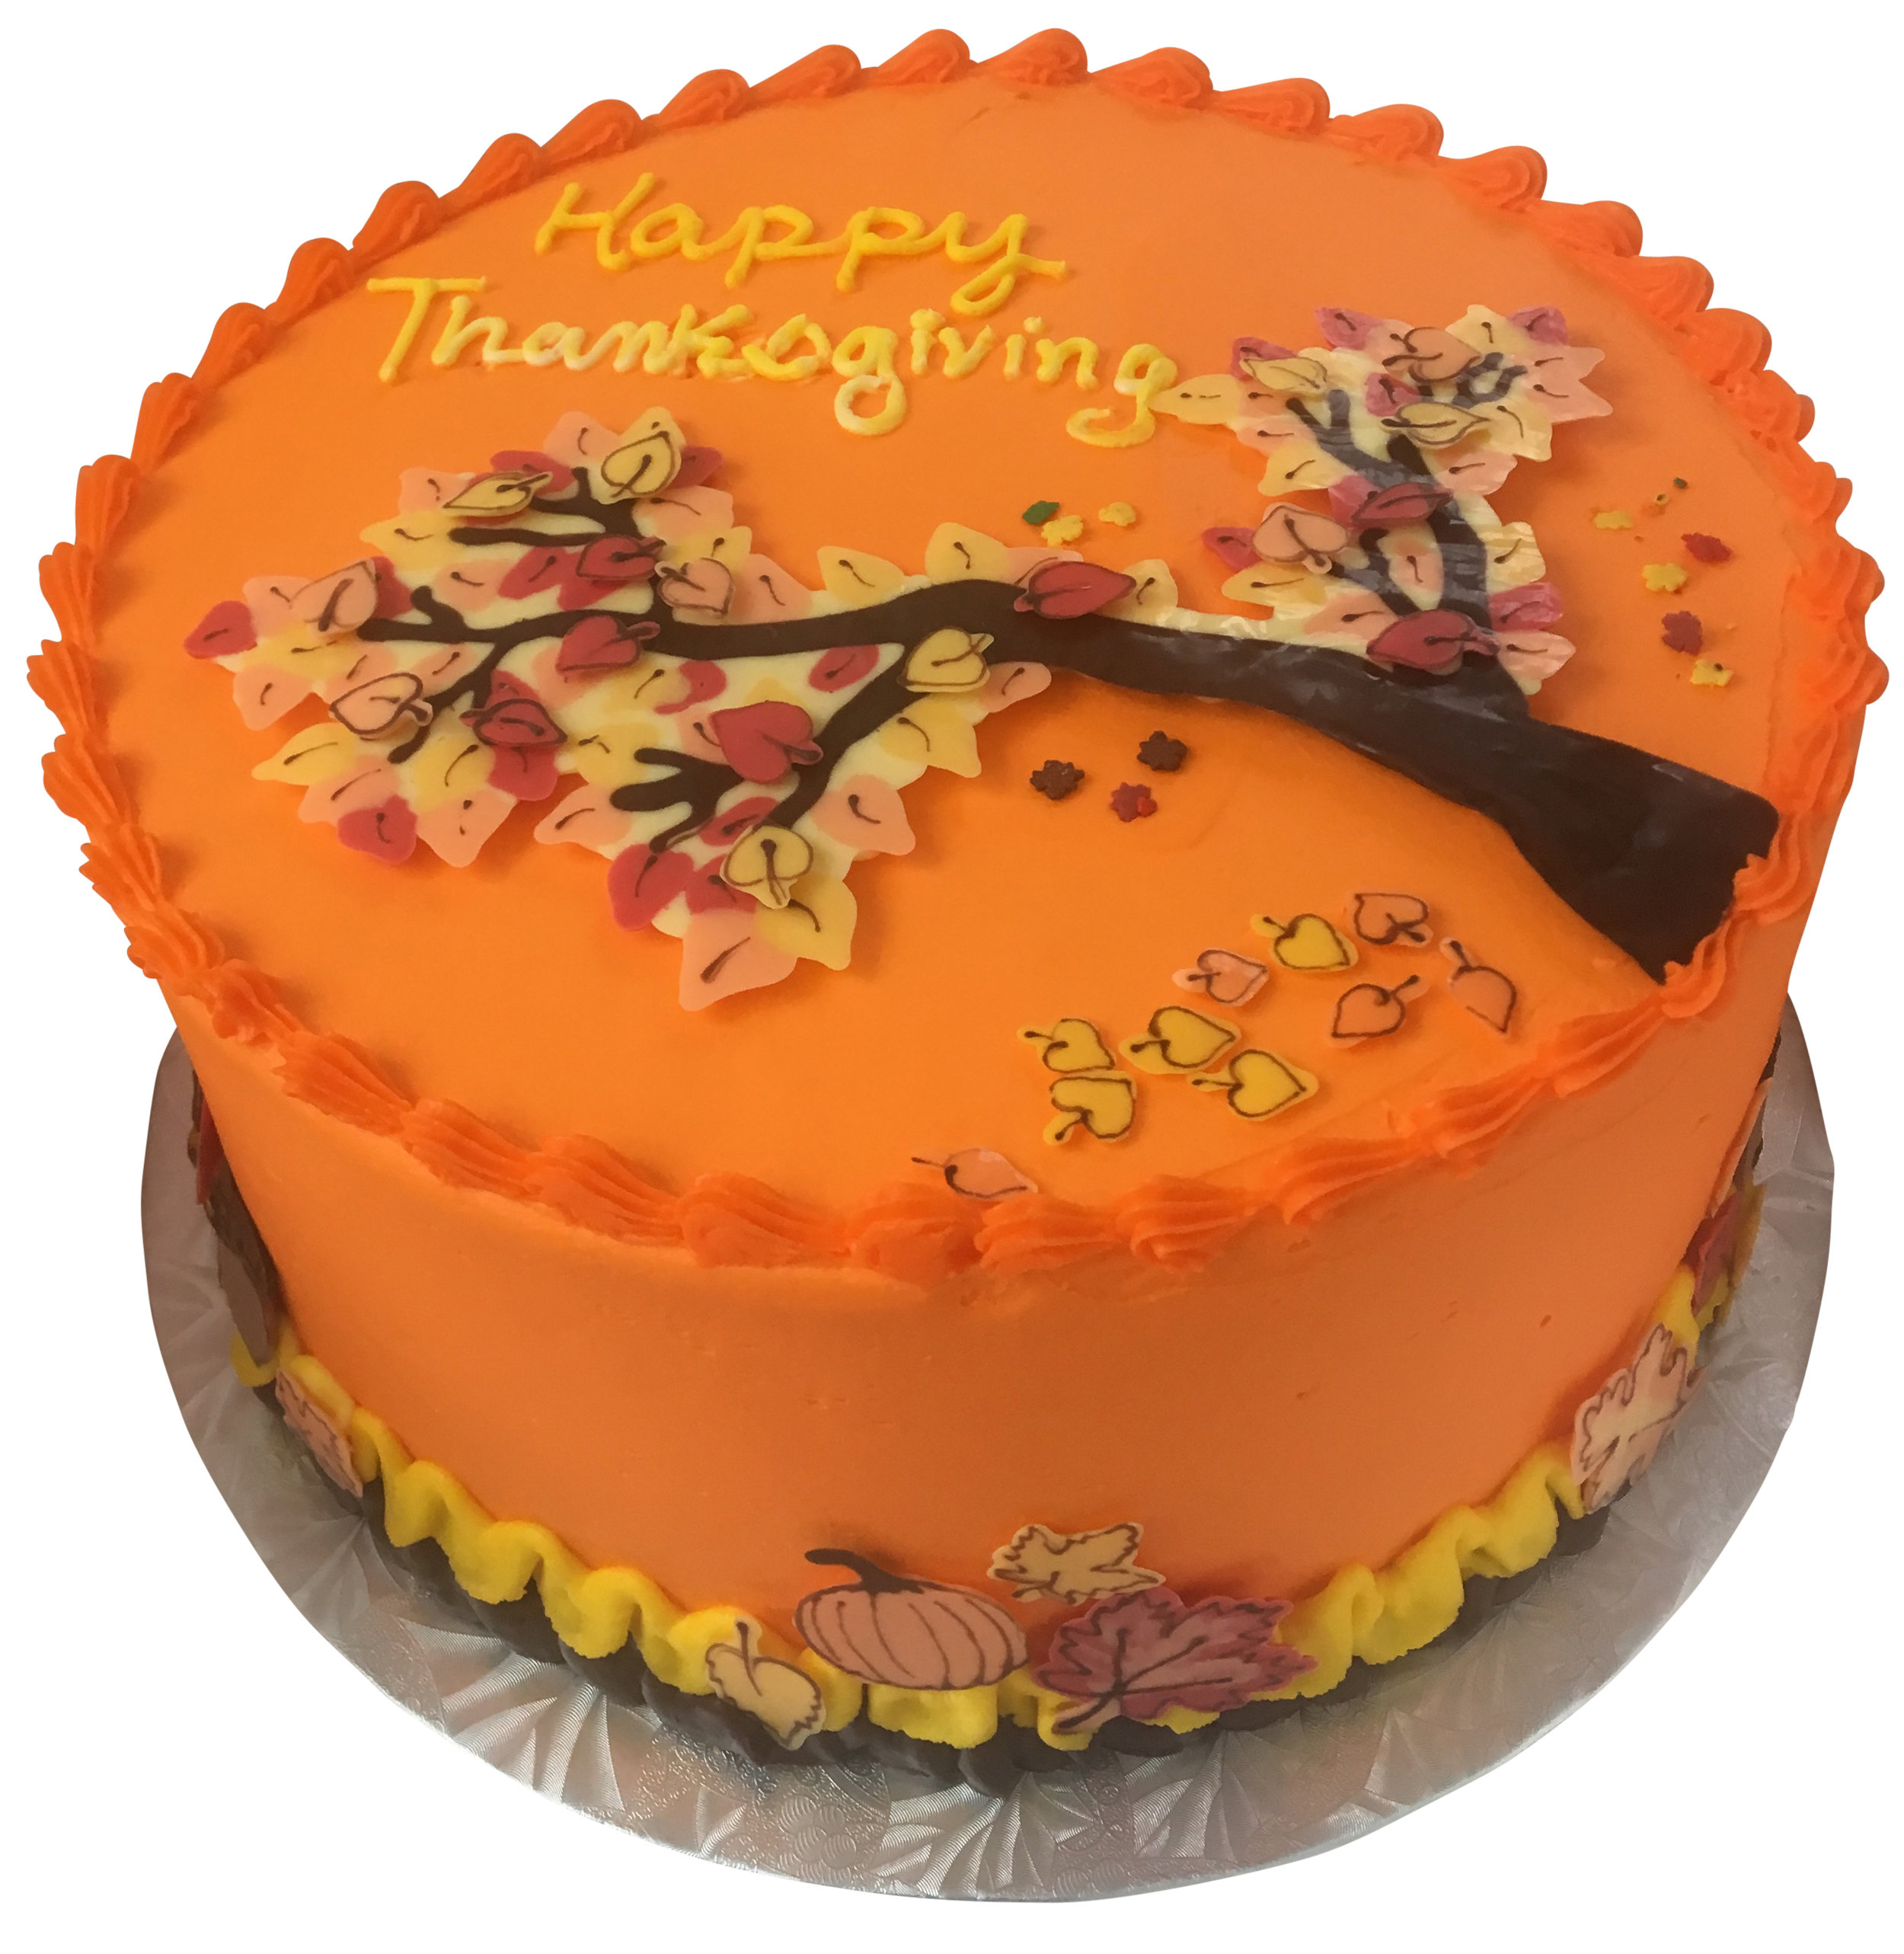 BeBe-Cakes-ThanksgivingBranch.JPG